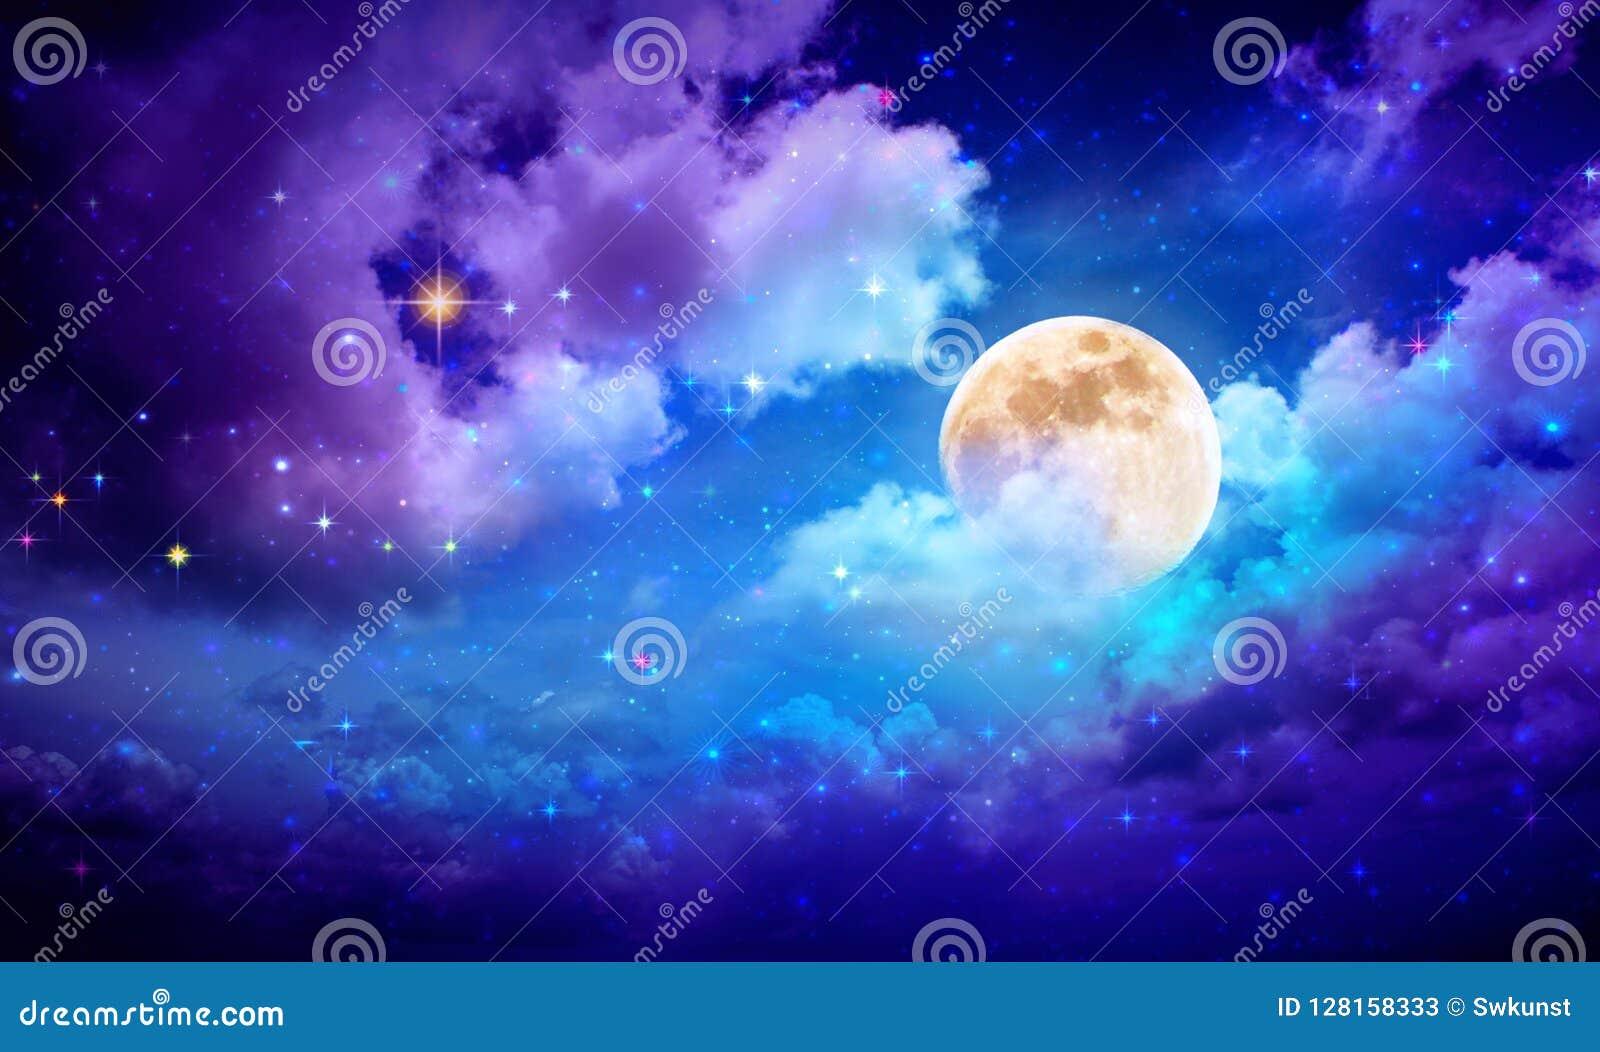 Full Moon With Stars At Dark Night Sky . Stock Image - Image of dark, blue:  128158333